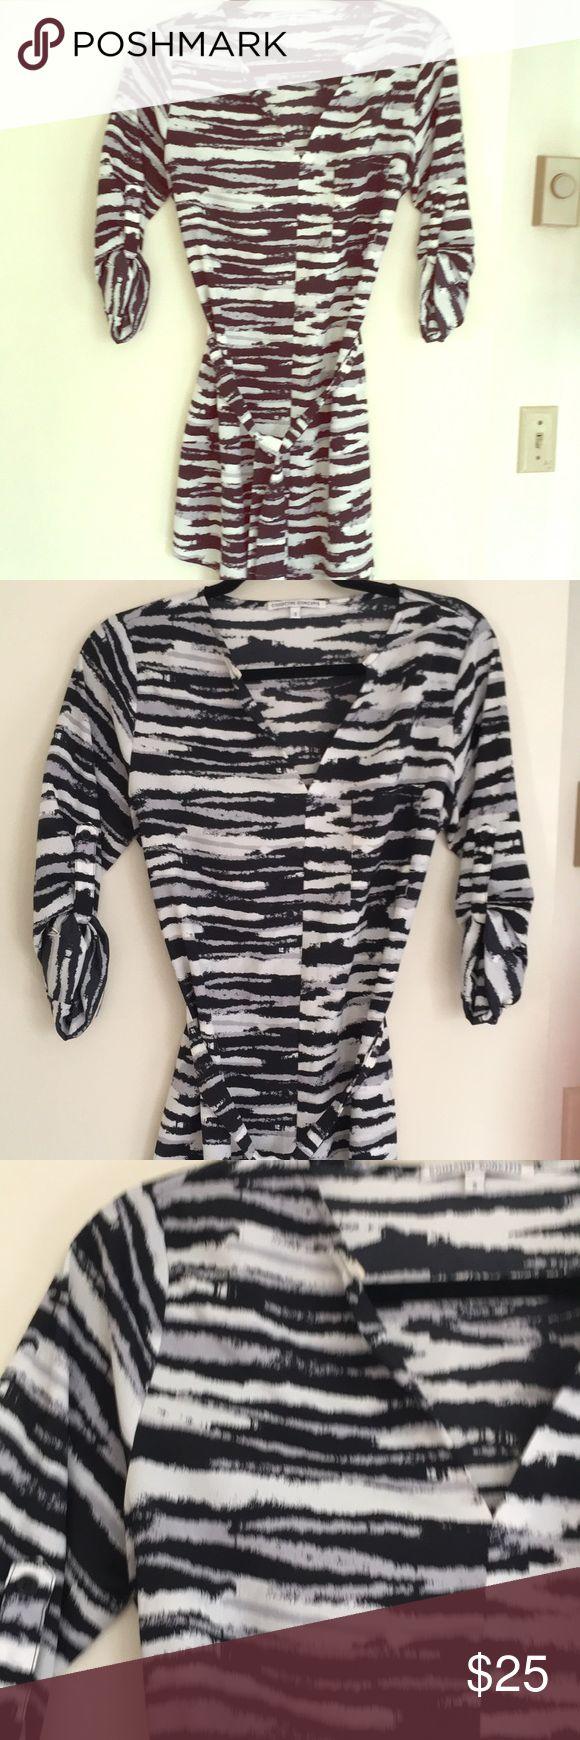 Zebra print dress! Zebra print , light material , worn once Collective Concepts Dresses Long Sleeve